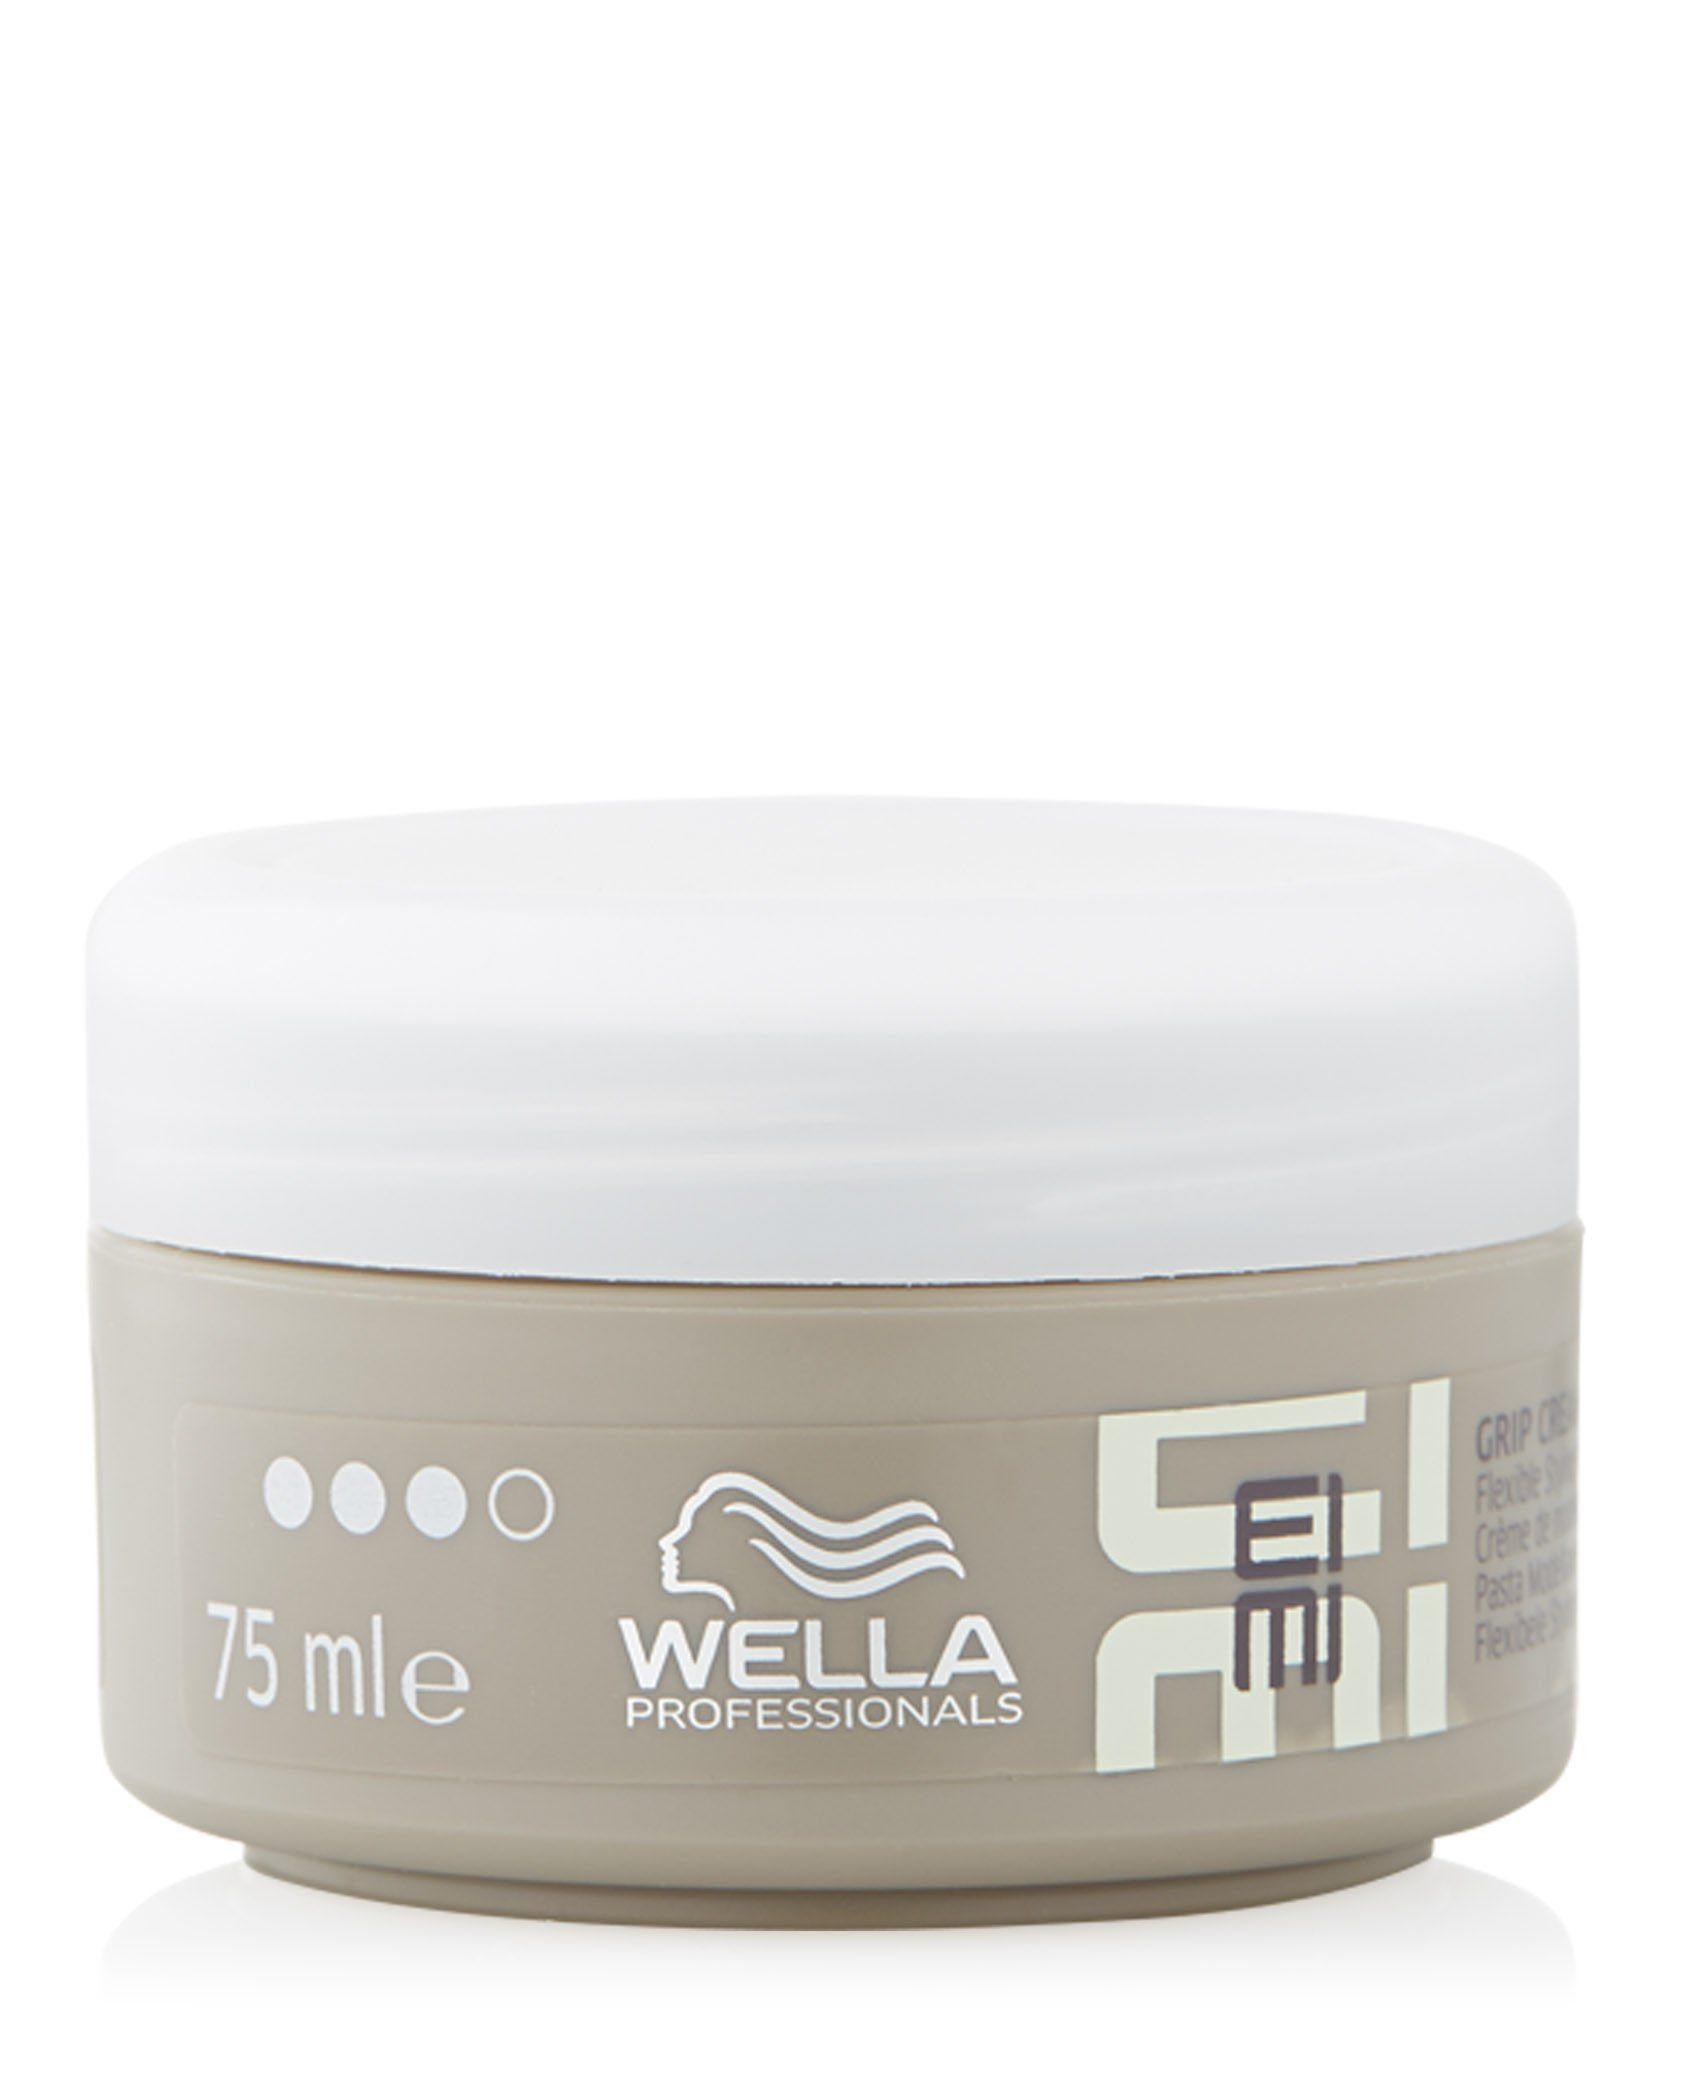 Wella Professionals Styling-Creme »Eimi«